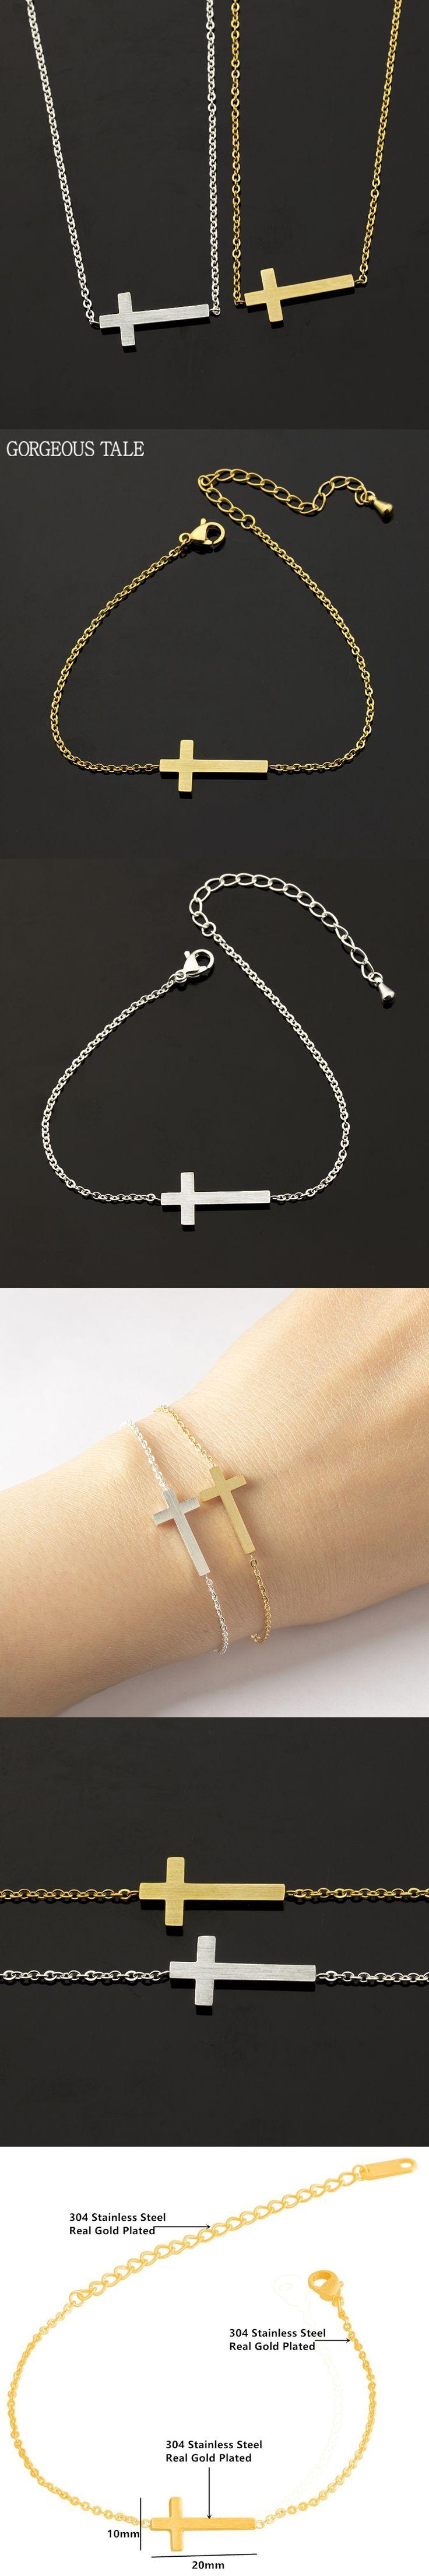 GEORGEOUS TALE Trendy Cross Chain Bracelets Stainless Steel Charm Bracelets Bangles For Women Jewelry Gold Pulseras Mujer